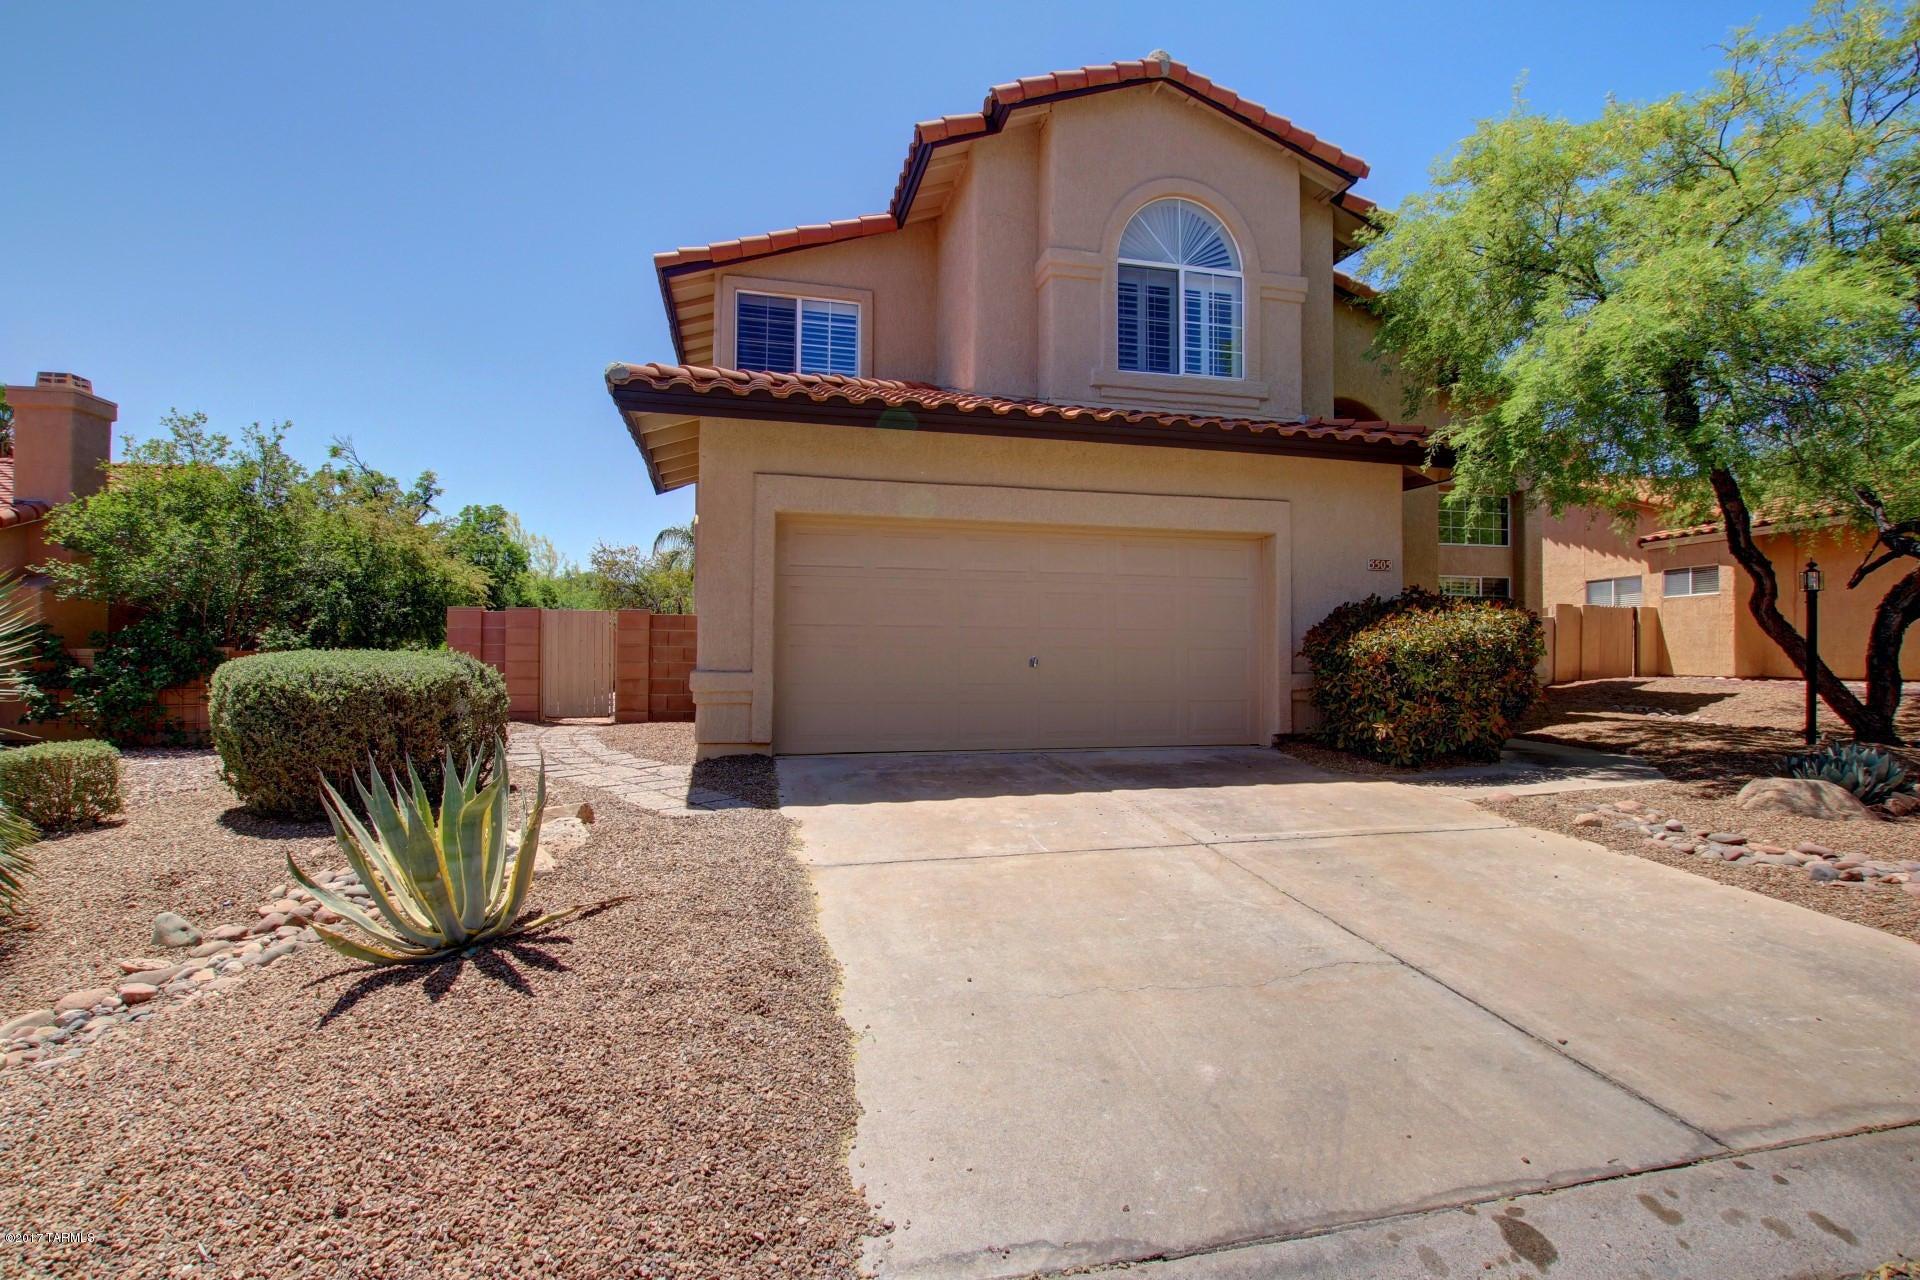 5505 N Indian Trail, Tucson, AZ 85750